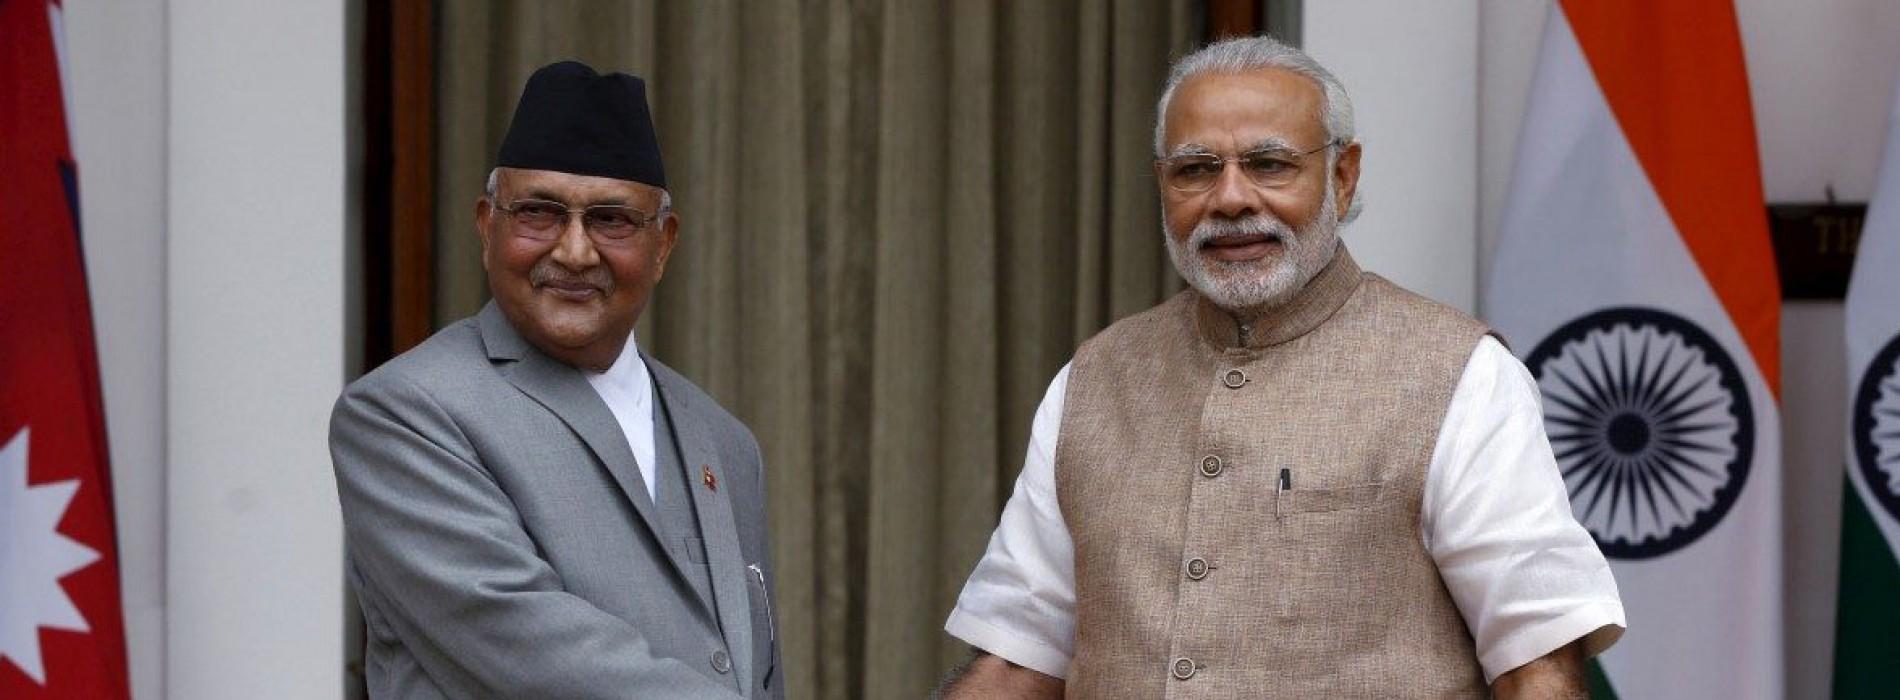 India to help Nepal construct a rail link to Kathmandu